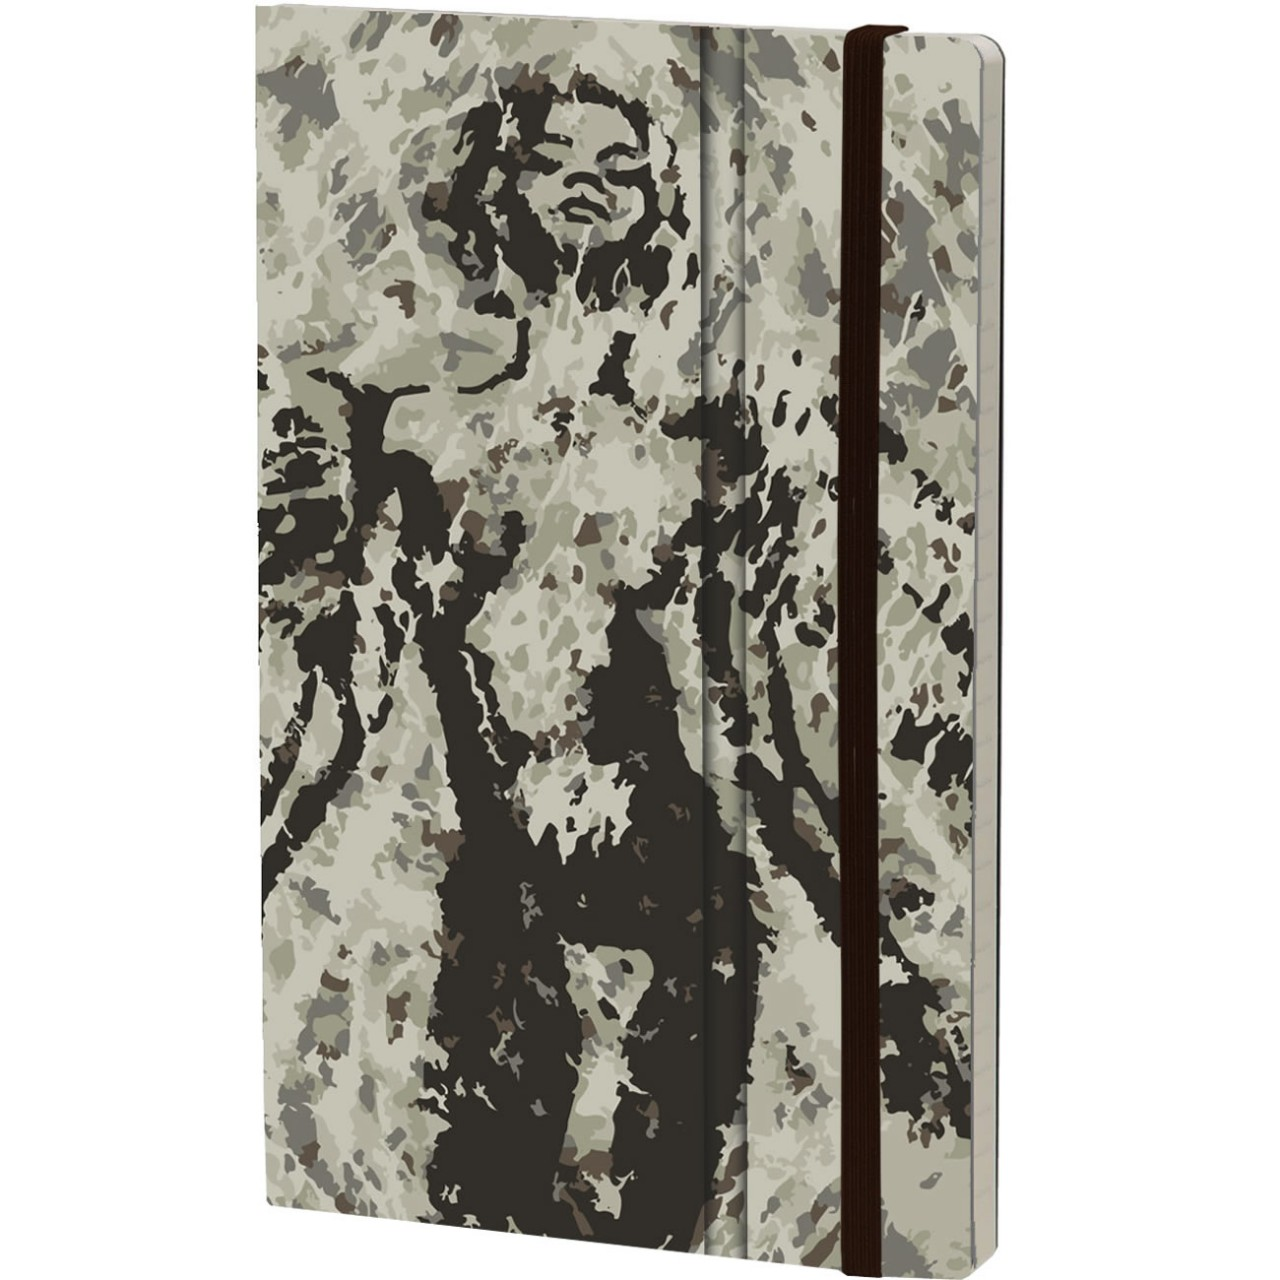 Stifflex Notizbuch PAINT - FRAGMENTATION 13 x 21 cm 192 S., ANGELO FURR